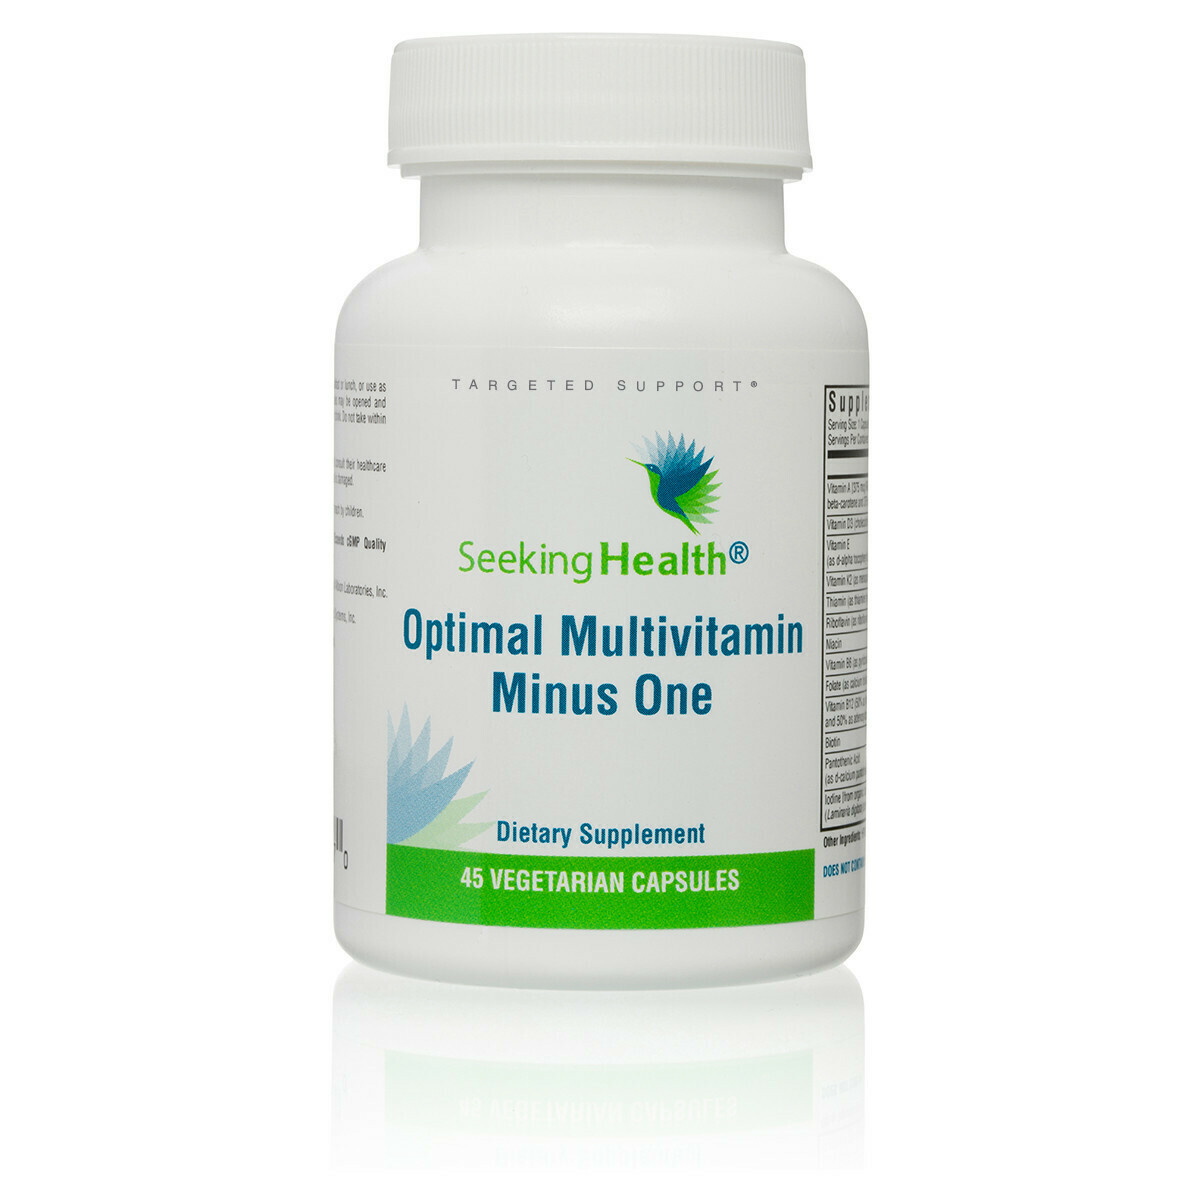 OPTIMAL MULTIVITAMIN MINUS ONE - 45 VEGETARIAN CAPSULES Seeking Health